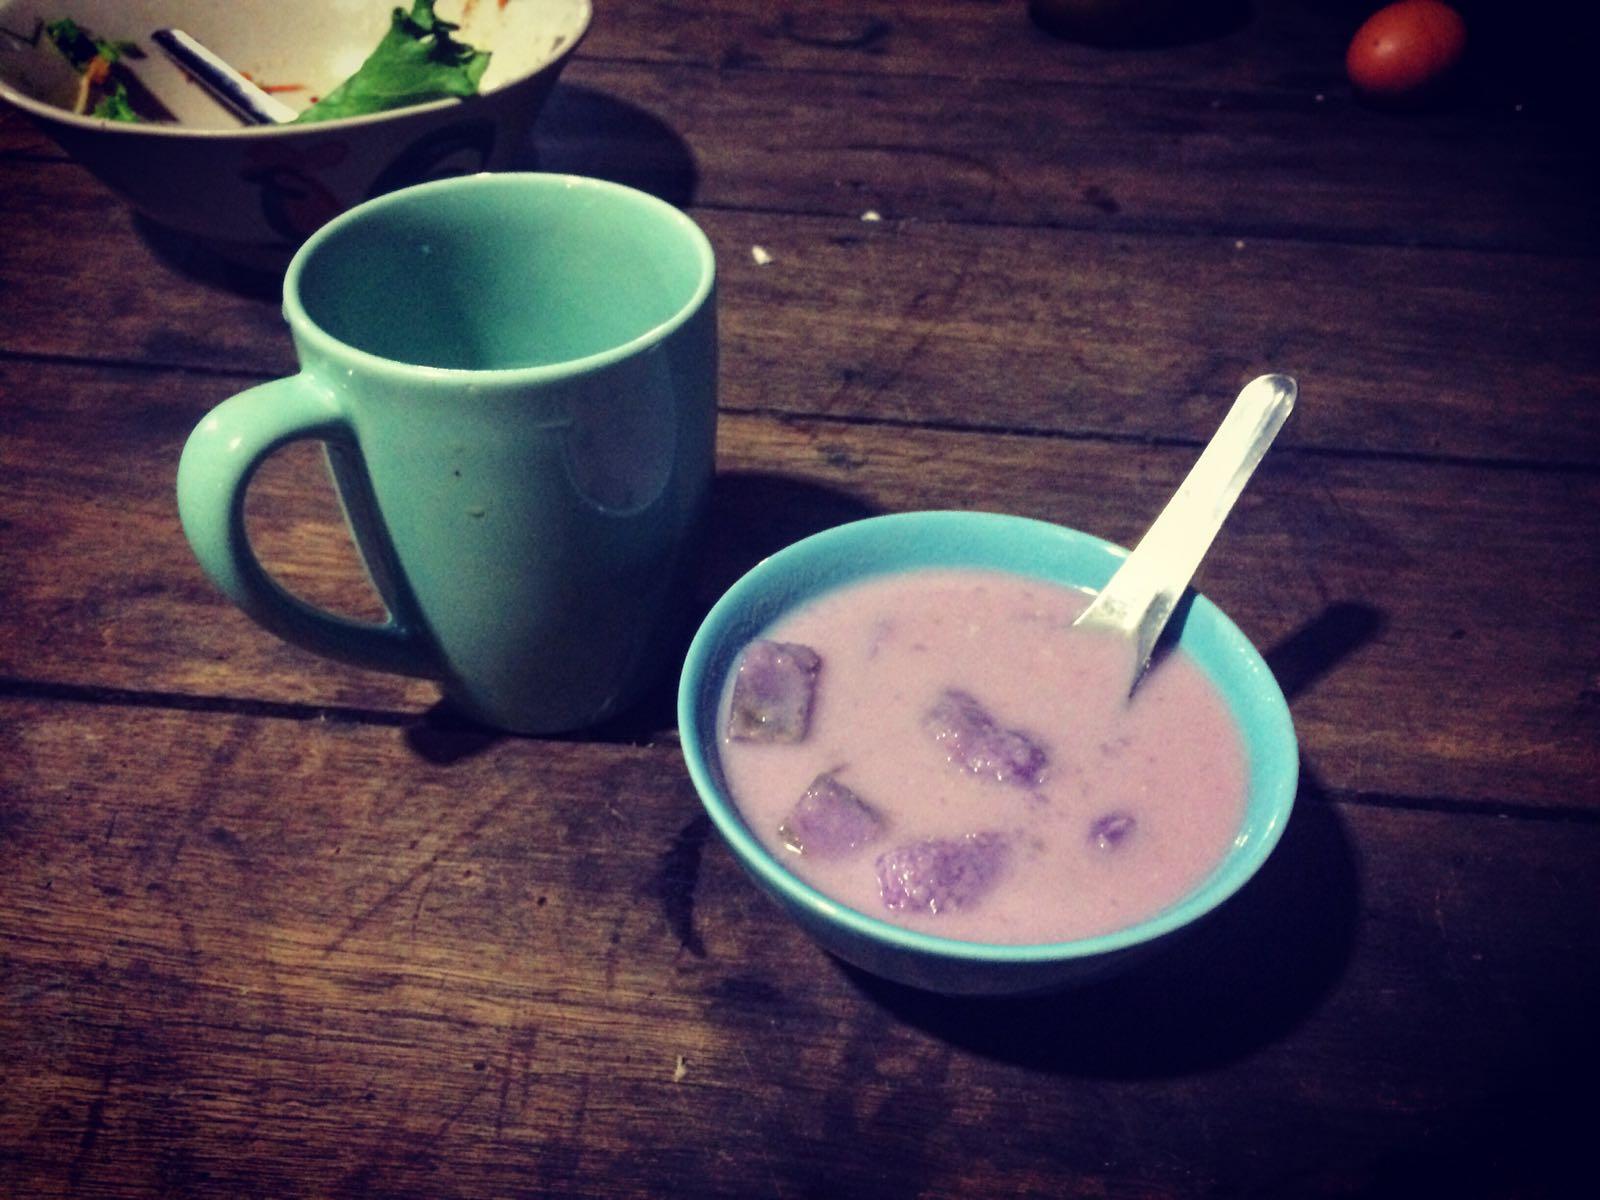 Purple Soup for dessert.